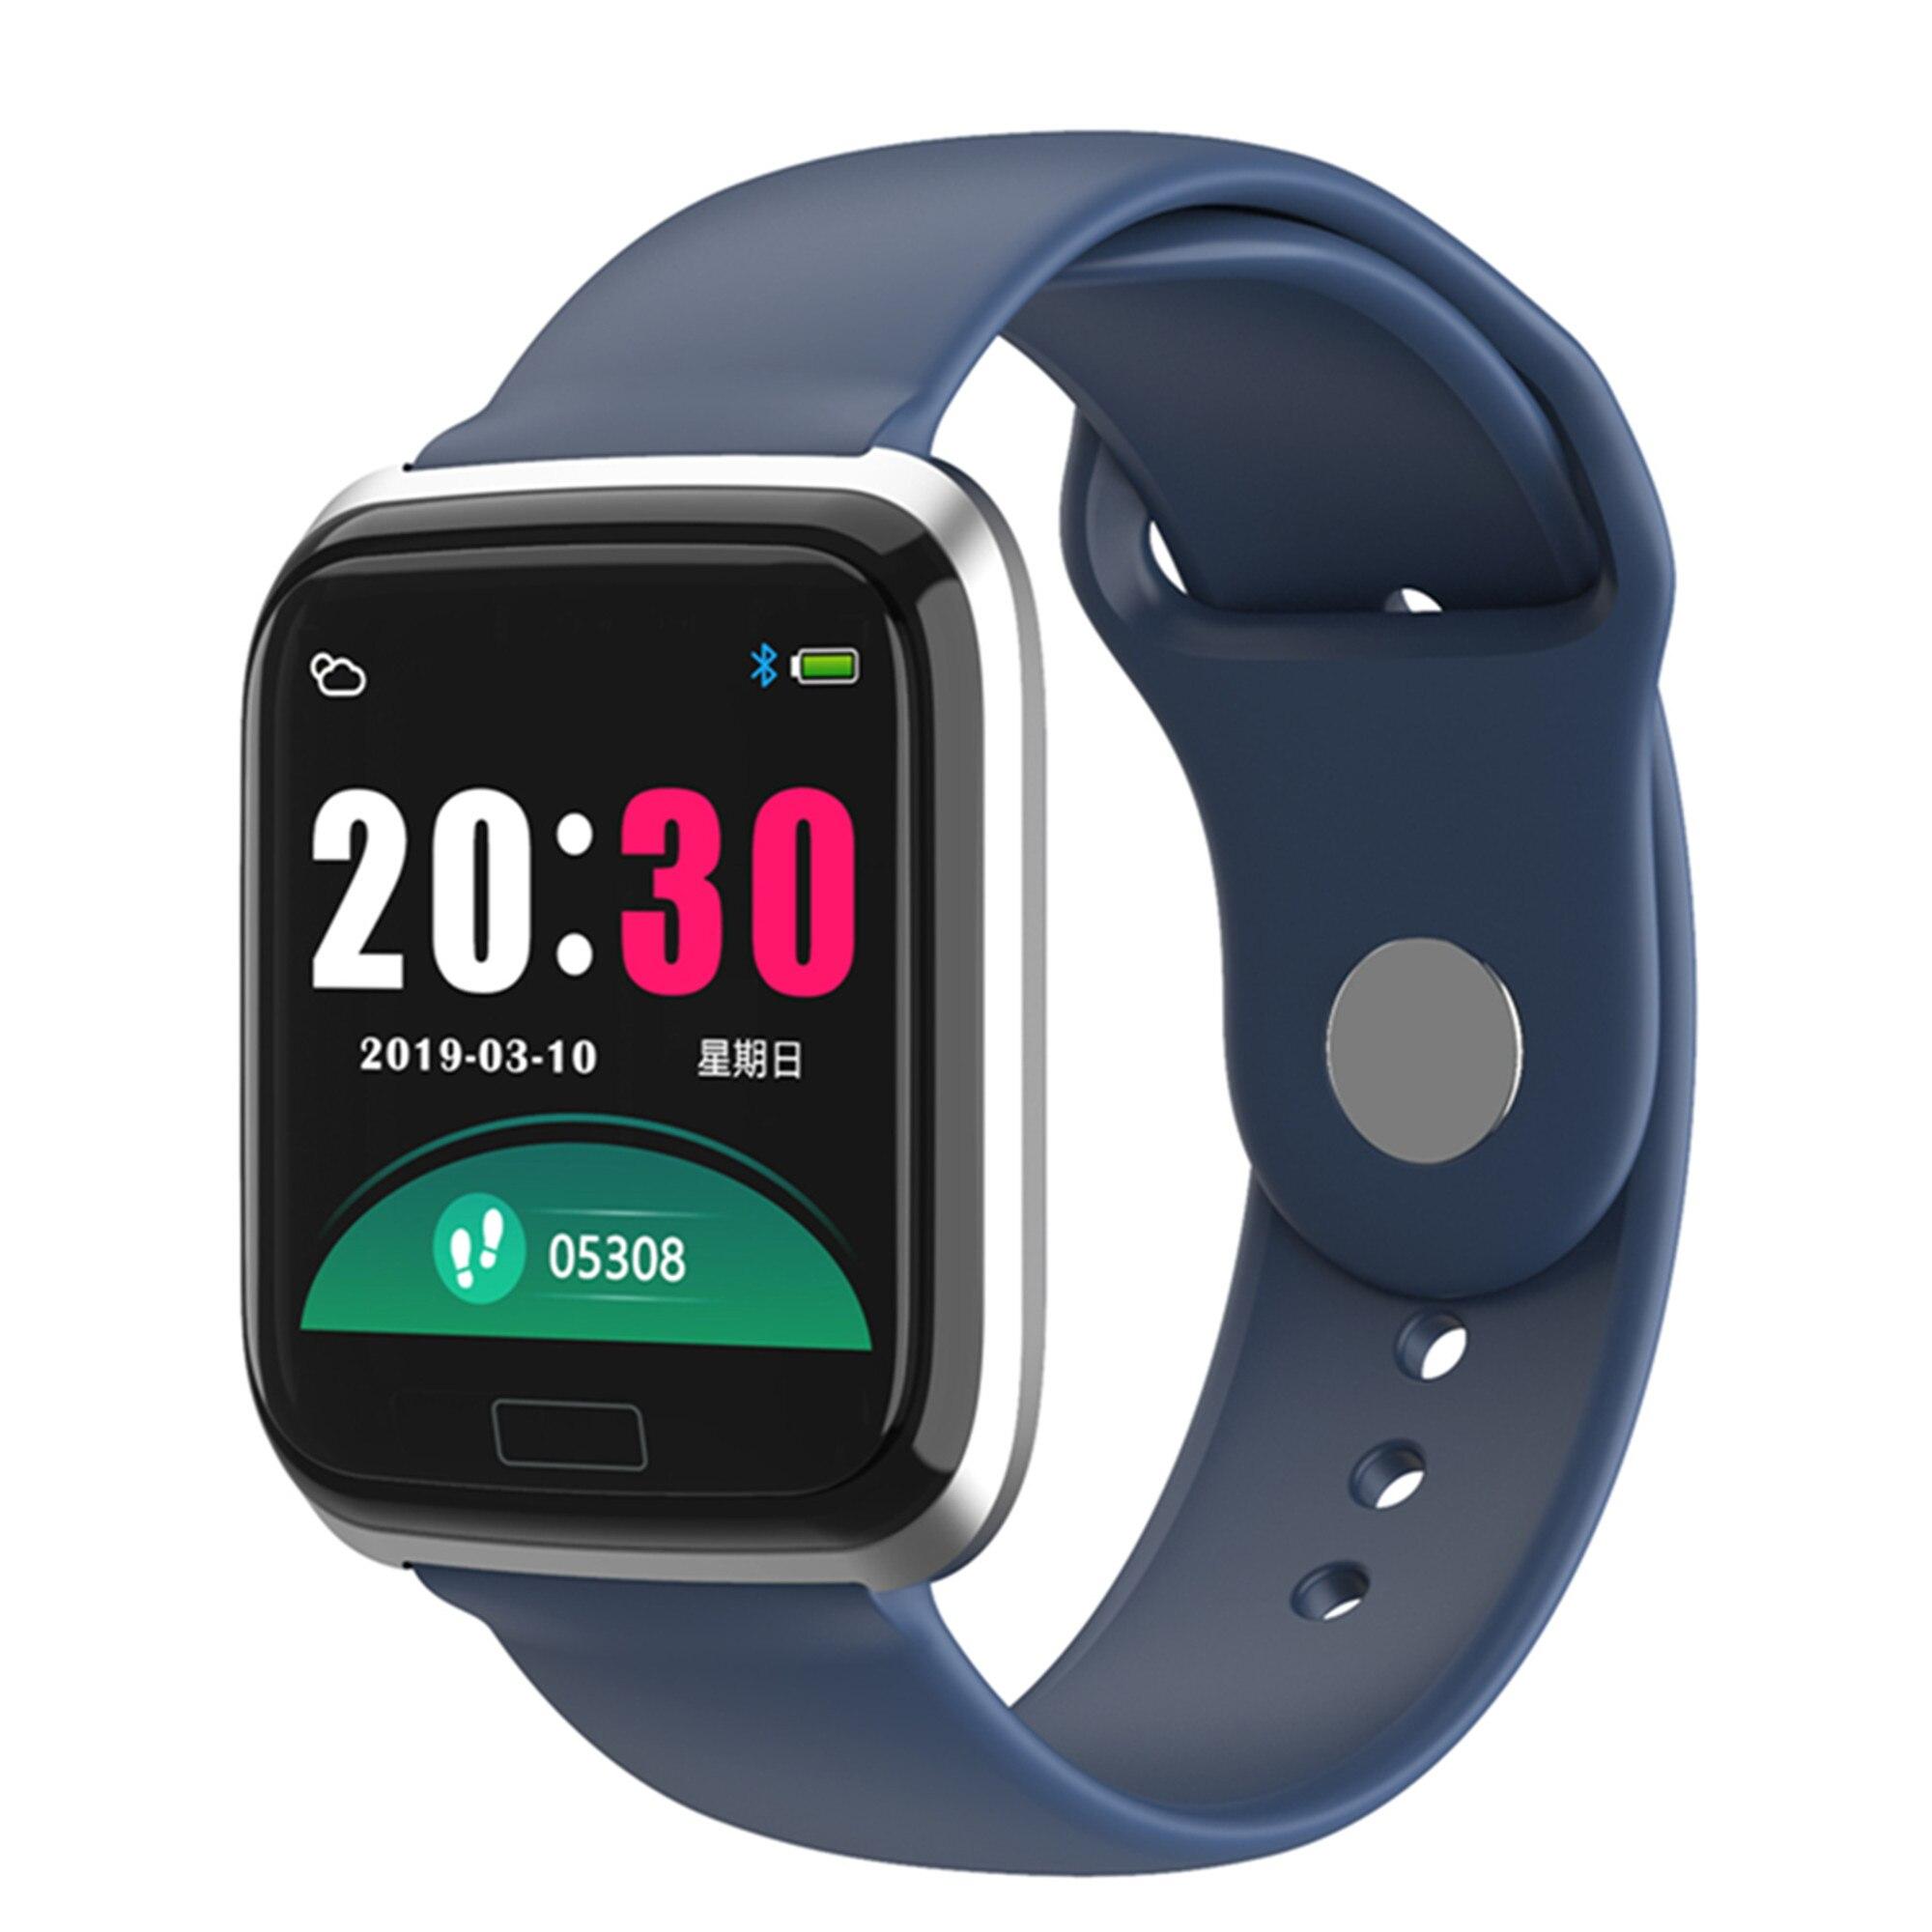 CY05 Smart Bracelet 1.3 Inch Color Fashion Sports Watch Waterproof Fitness Tracker Heart Rate Blood Pressure Step Monitor PK B57